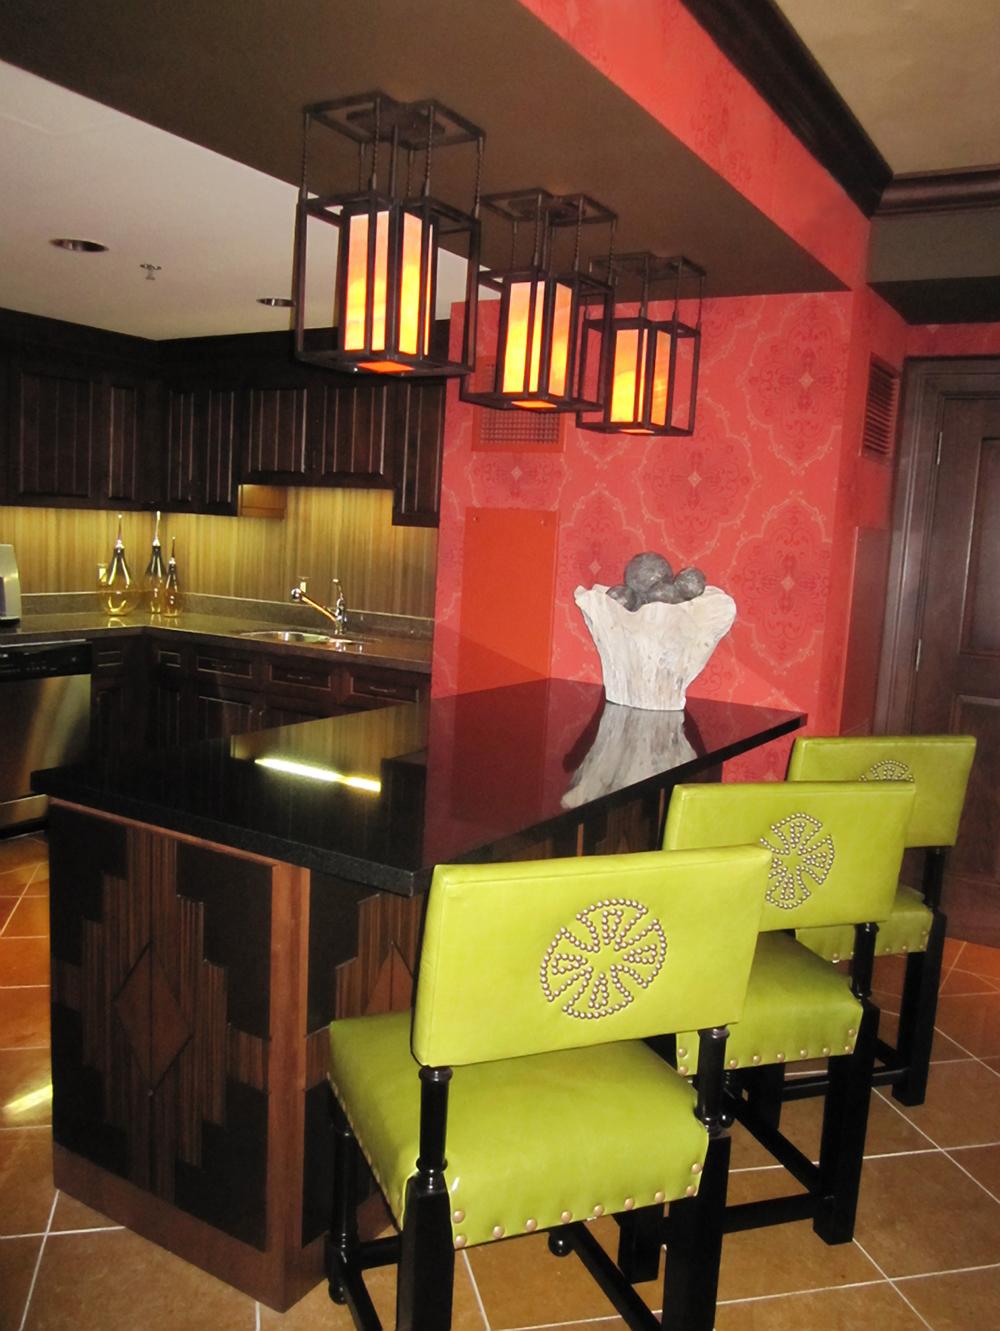 dfchase-hotels-gaylord-texan-presidential-suite4.jpg